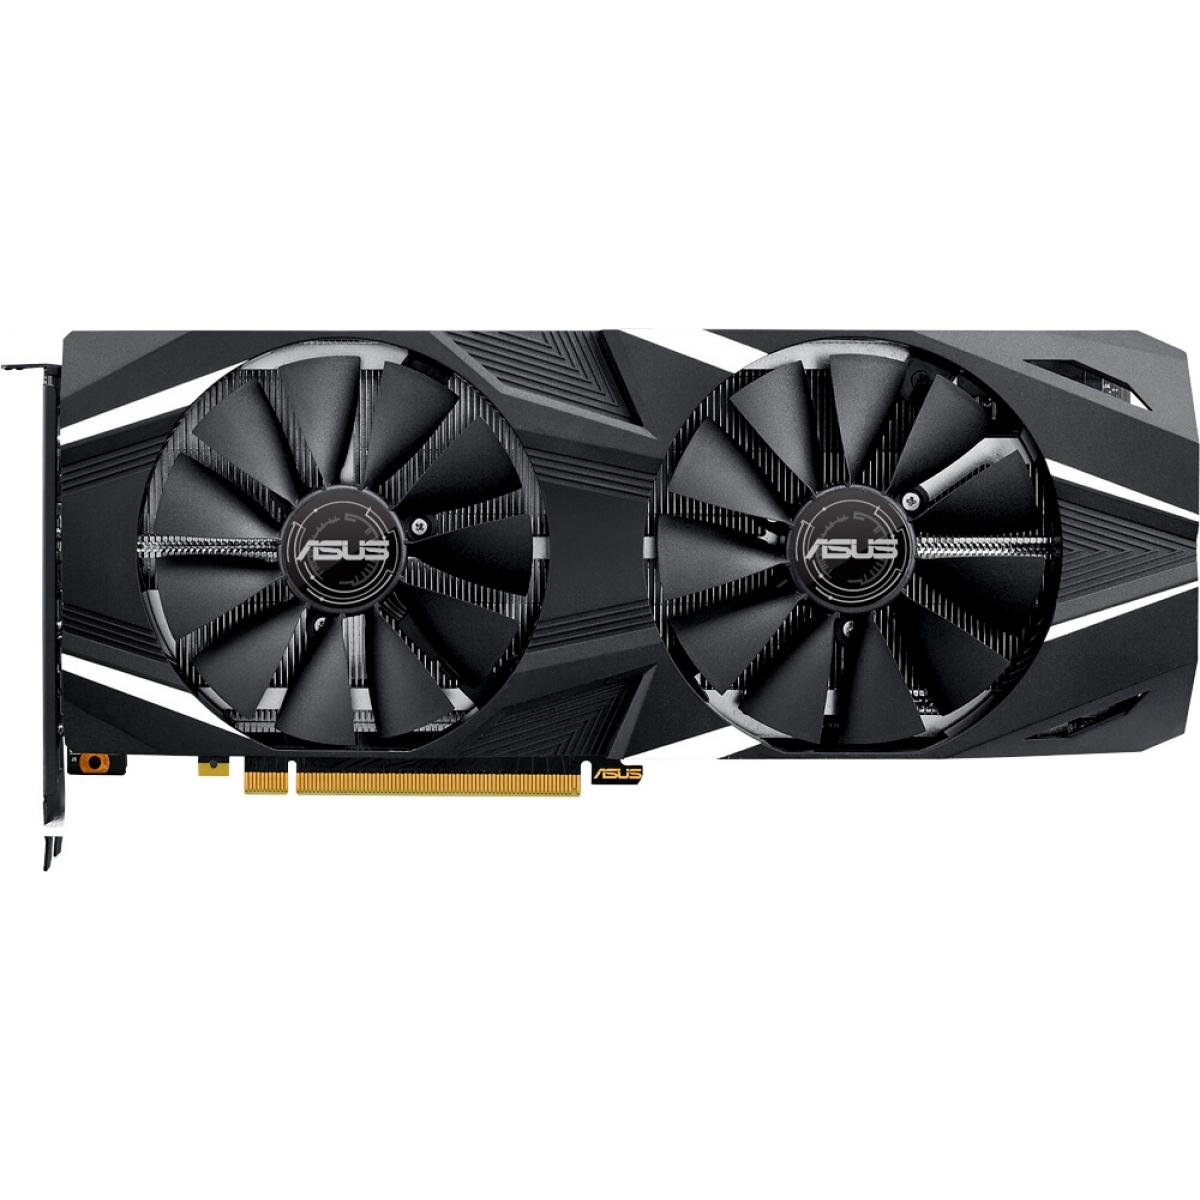 Placa de Vídeo Asus Geforce RTX 2070 DUAL OC, 8GB GDDR6, 256Bit, DUAL-RTX2070-O8G